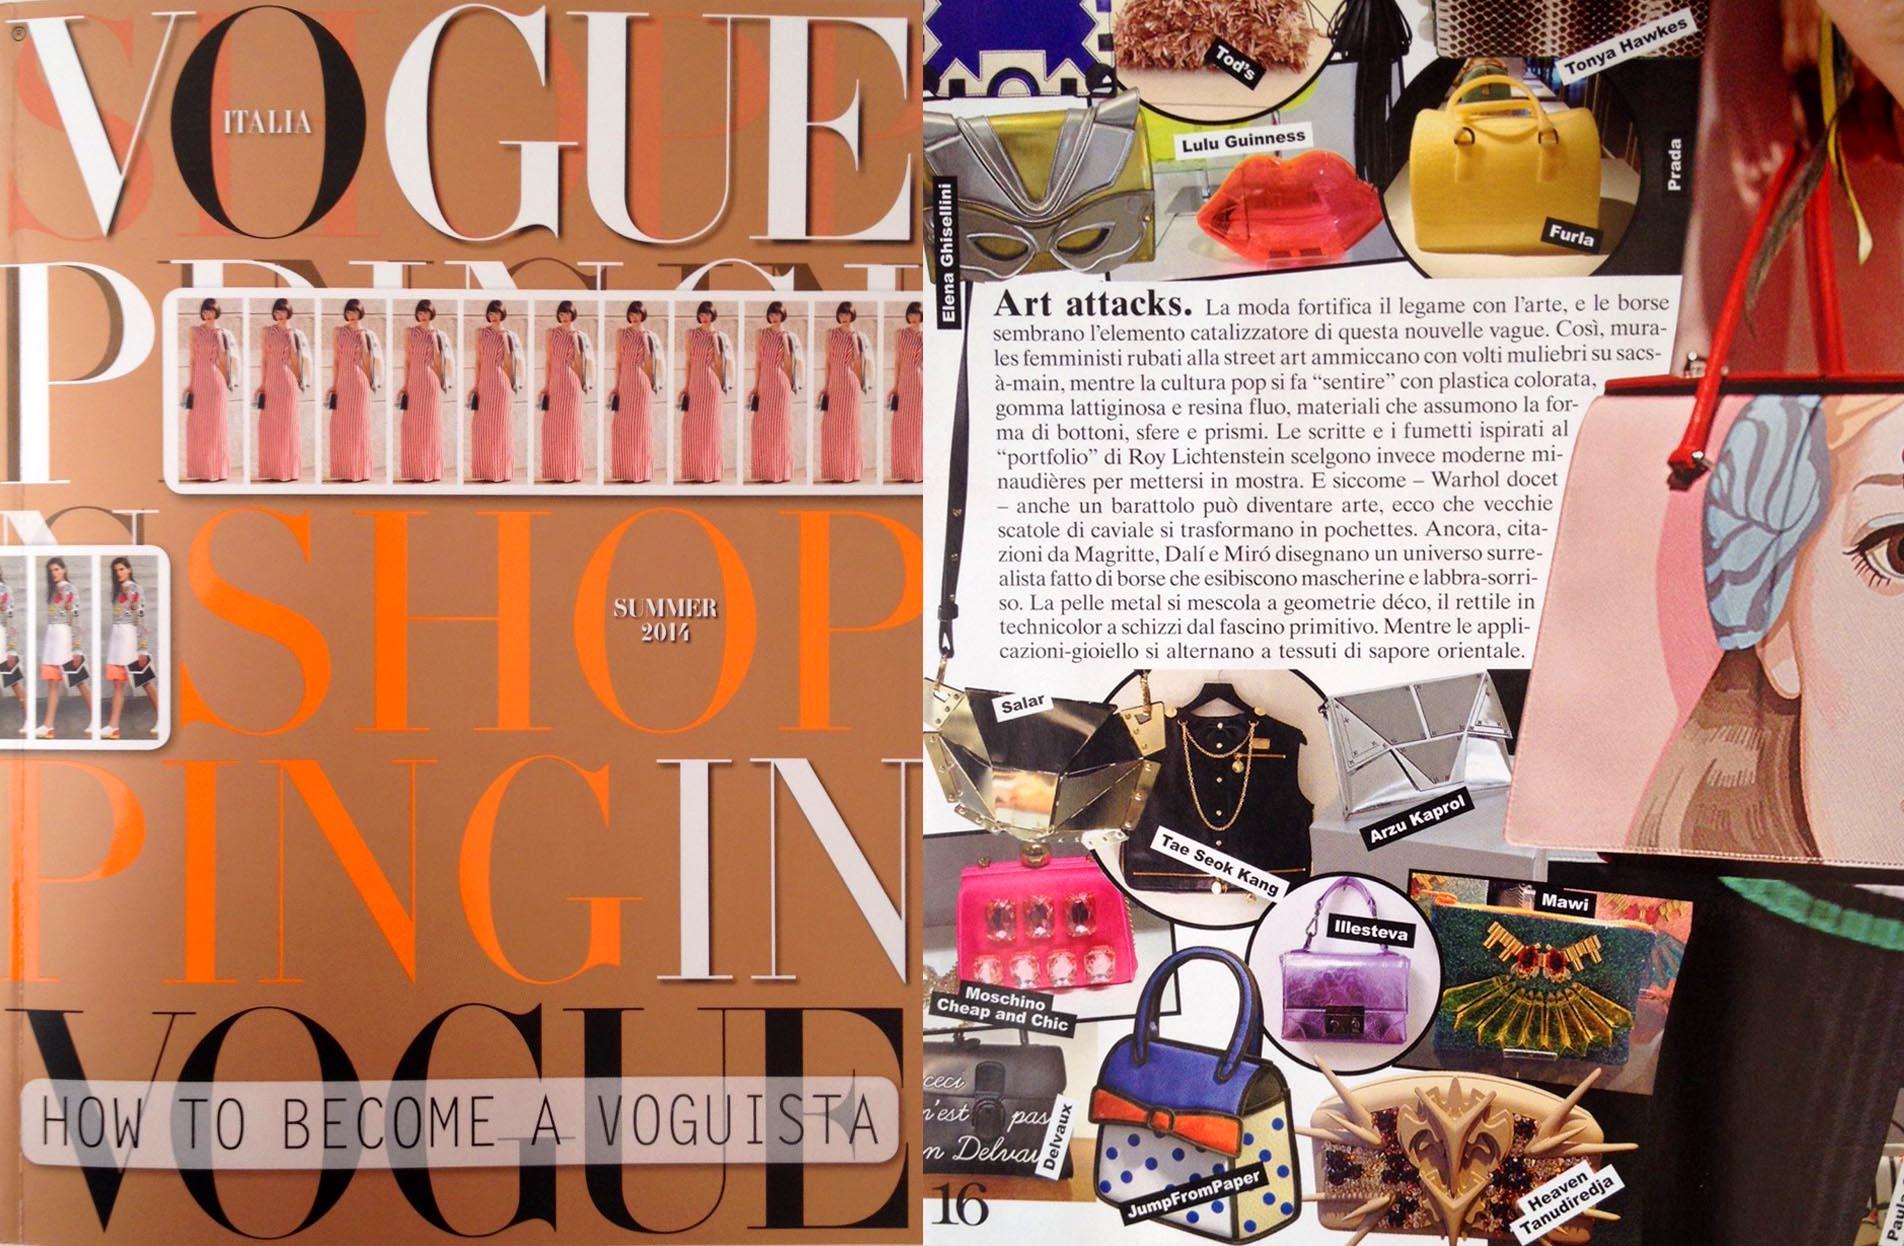 Vogue Shoping - Febrary 2014 - Italy - p 16 - Xagauara